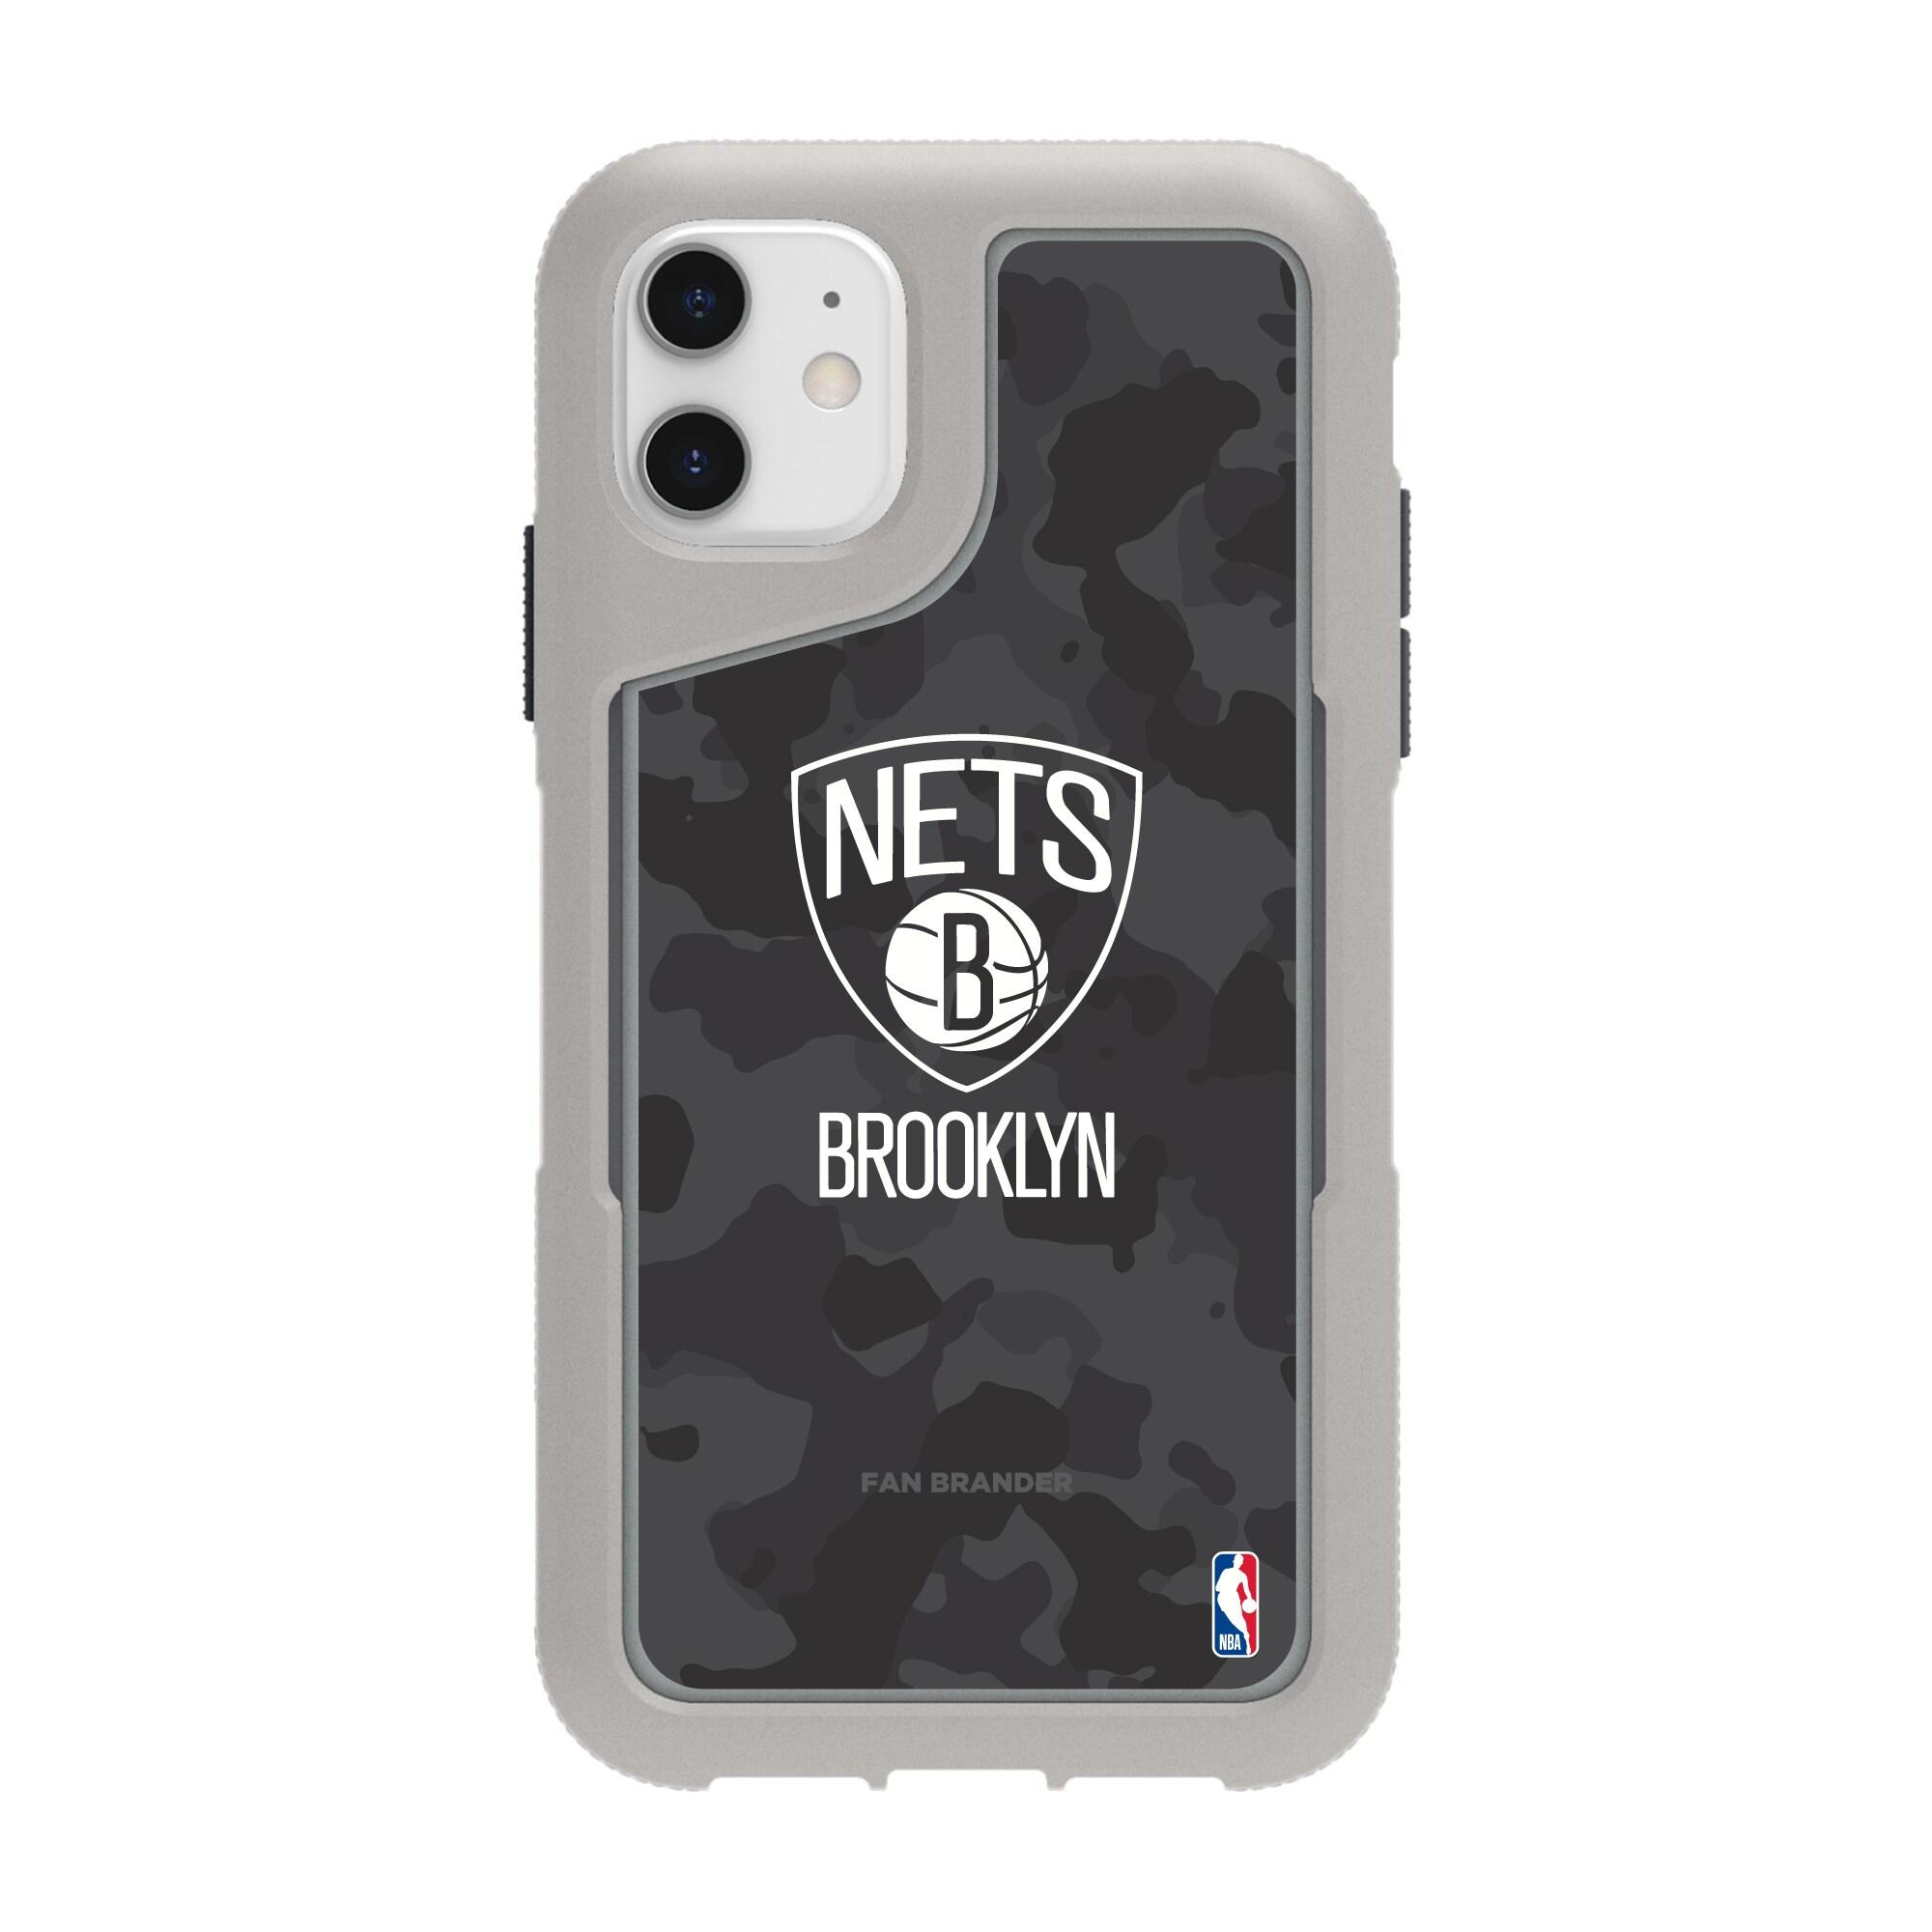 Brooklyn Nets Griffin Survivor Endurance Camo iPhone Case - Gray